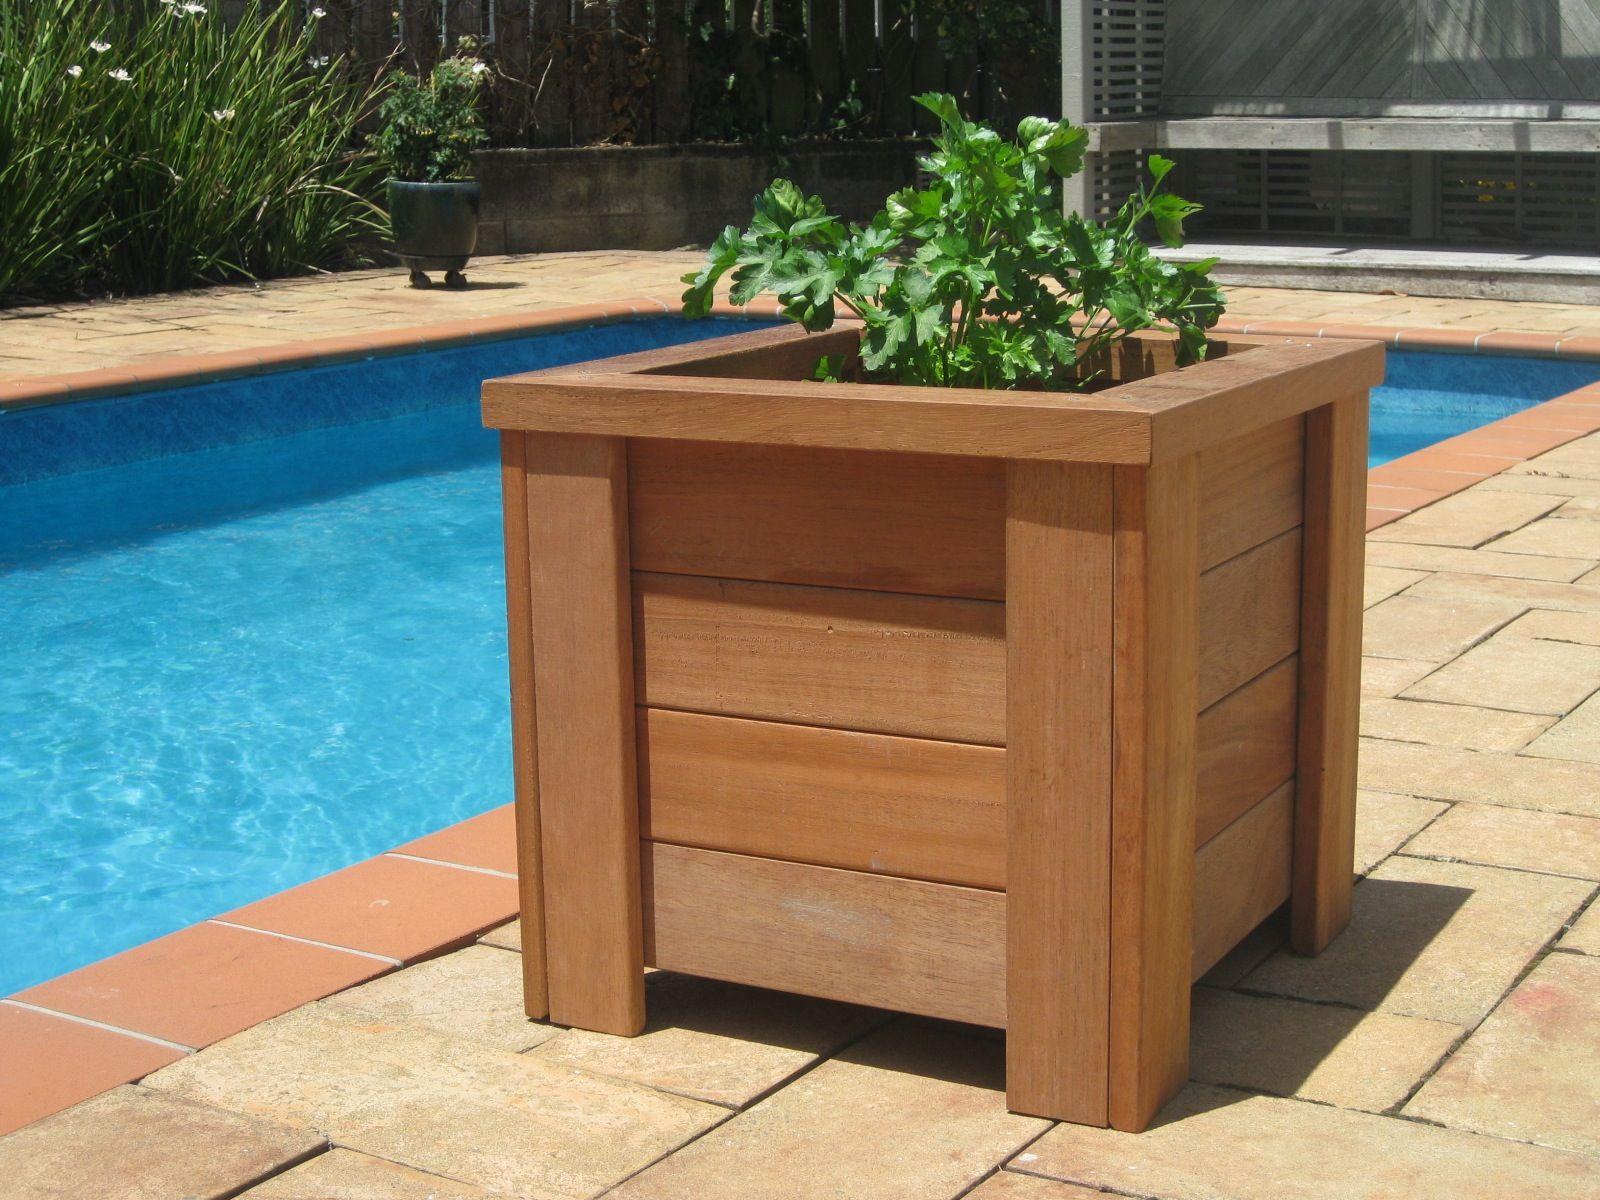 Planters Boxes Google Search Garden Planter Boxes Diy 400 x 300